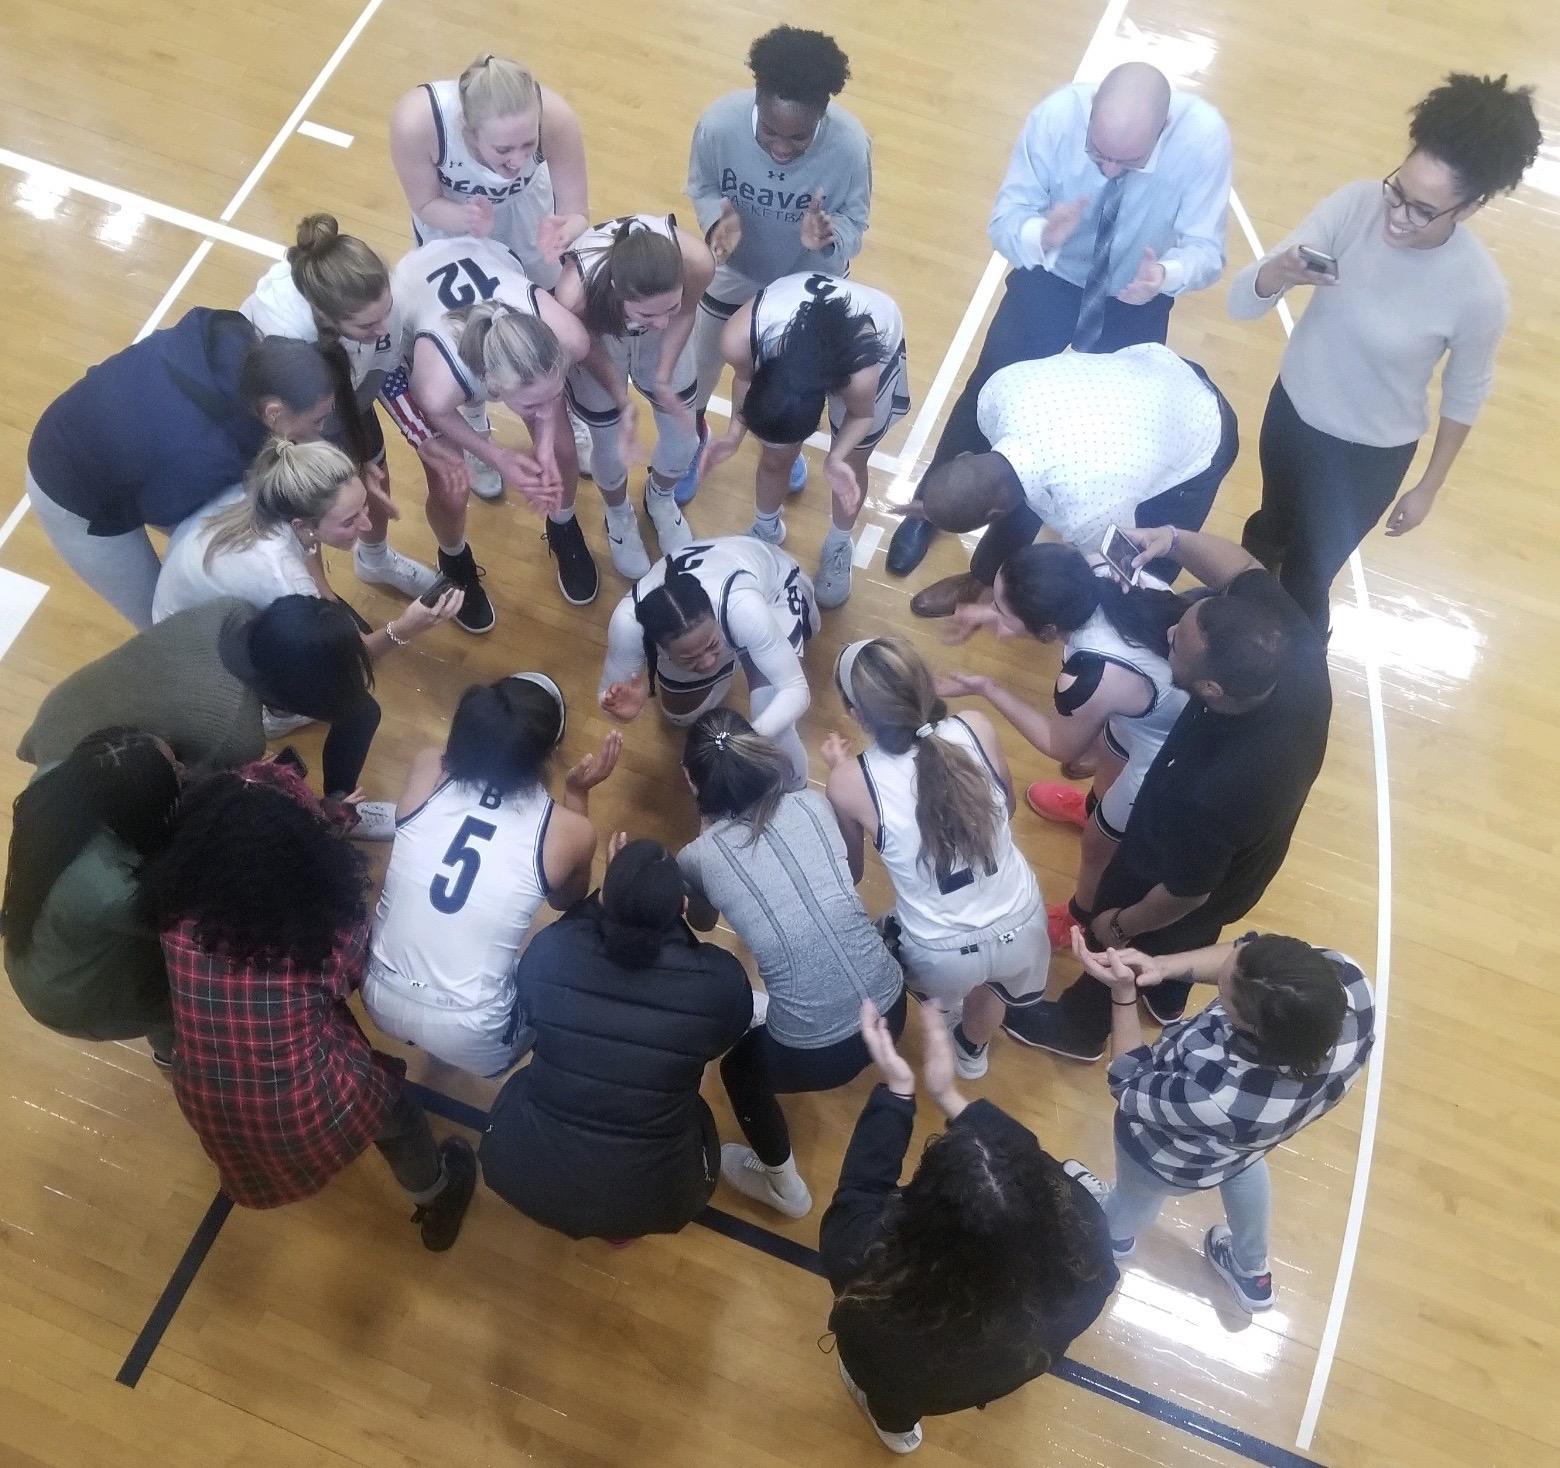 A basketball team huddle. Photo courtesy of Zoë Powell-McCroey.